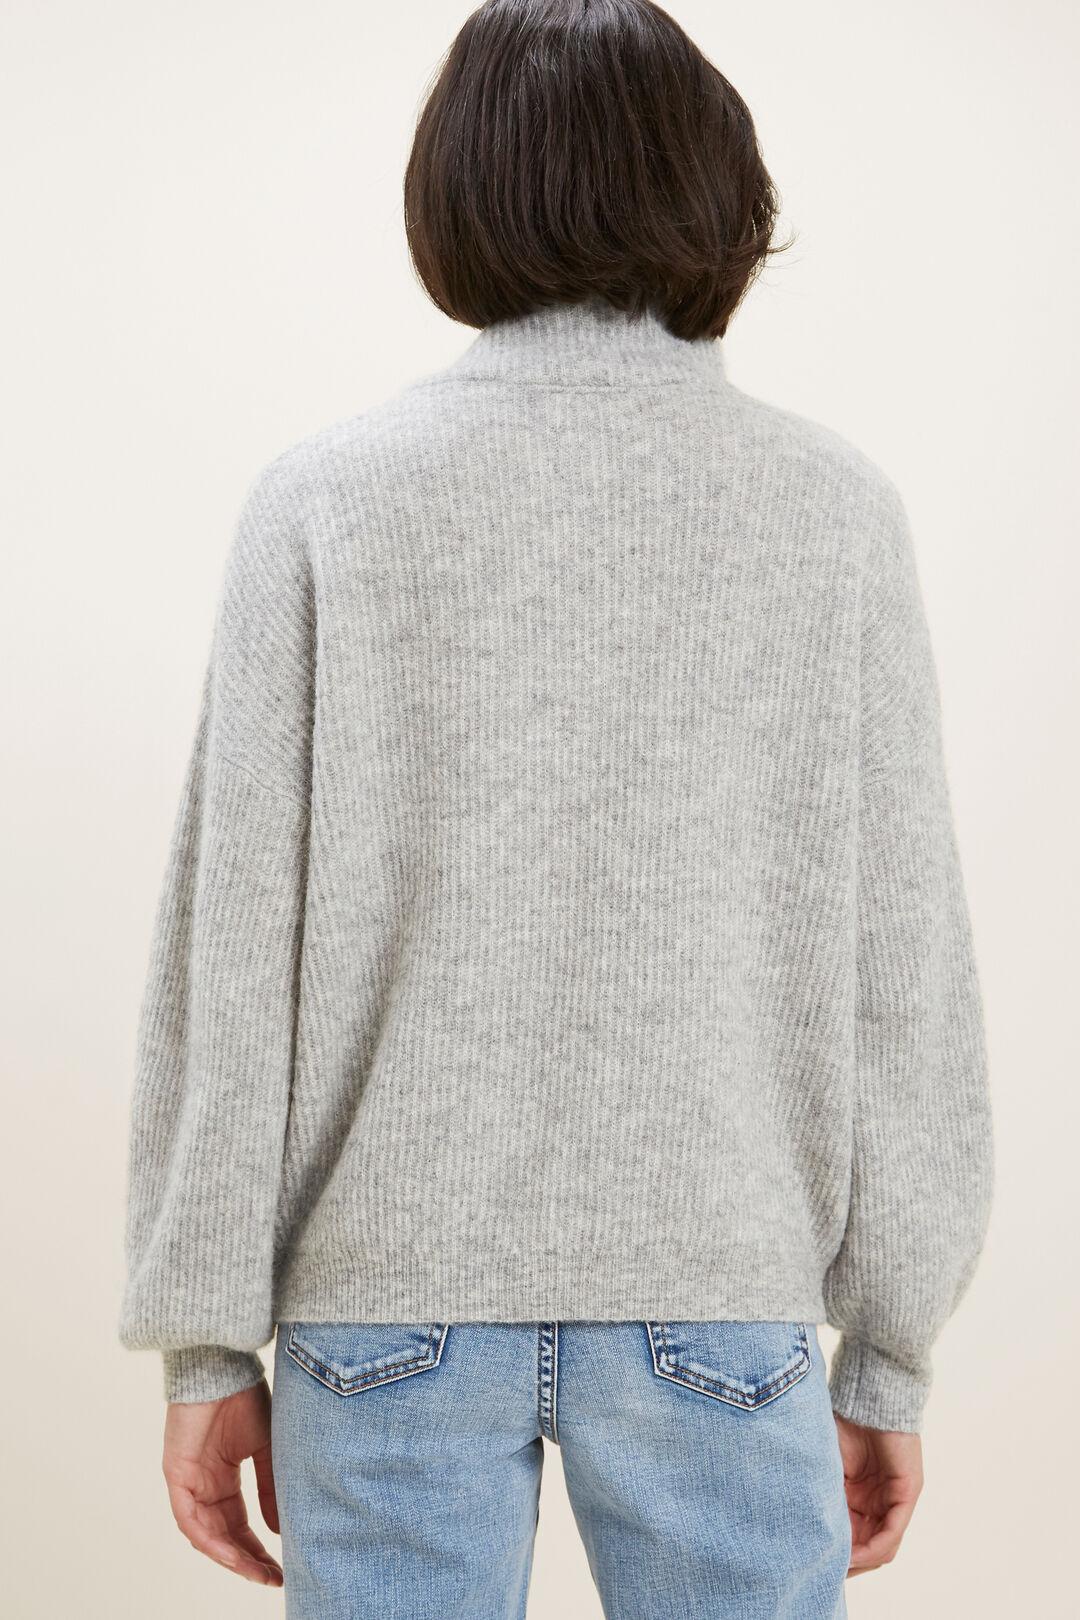 Button Down Sweater   DIM GREY MARLE  hi-res